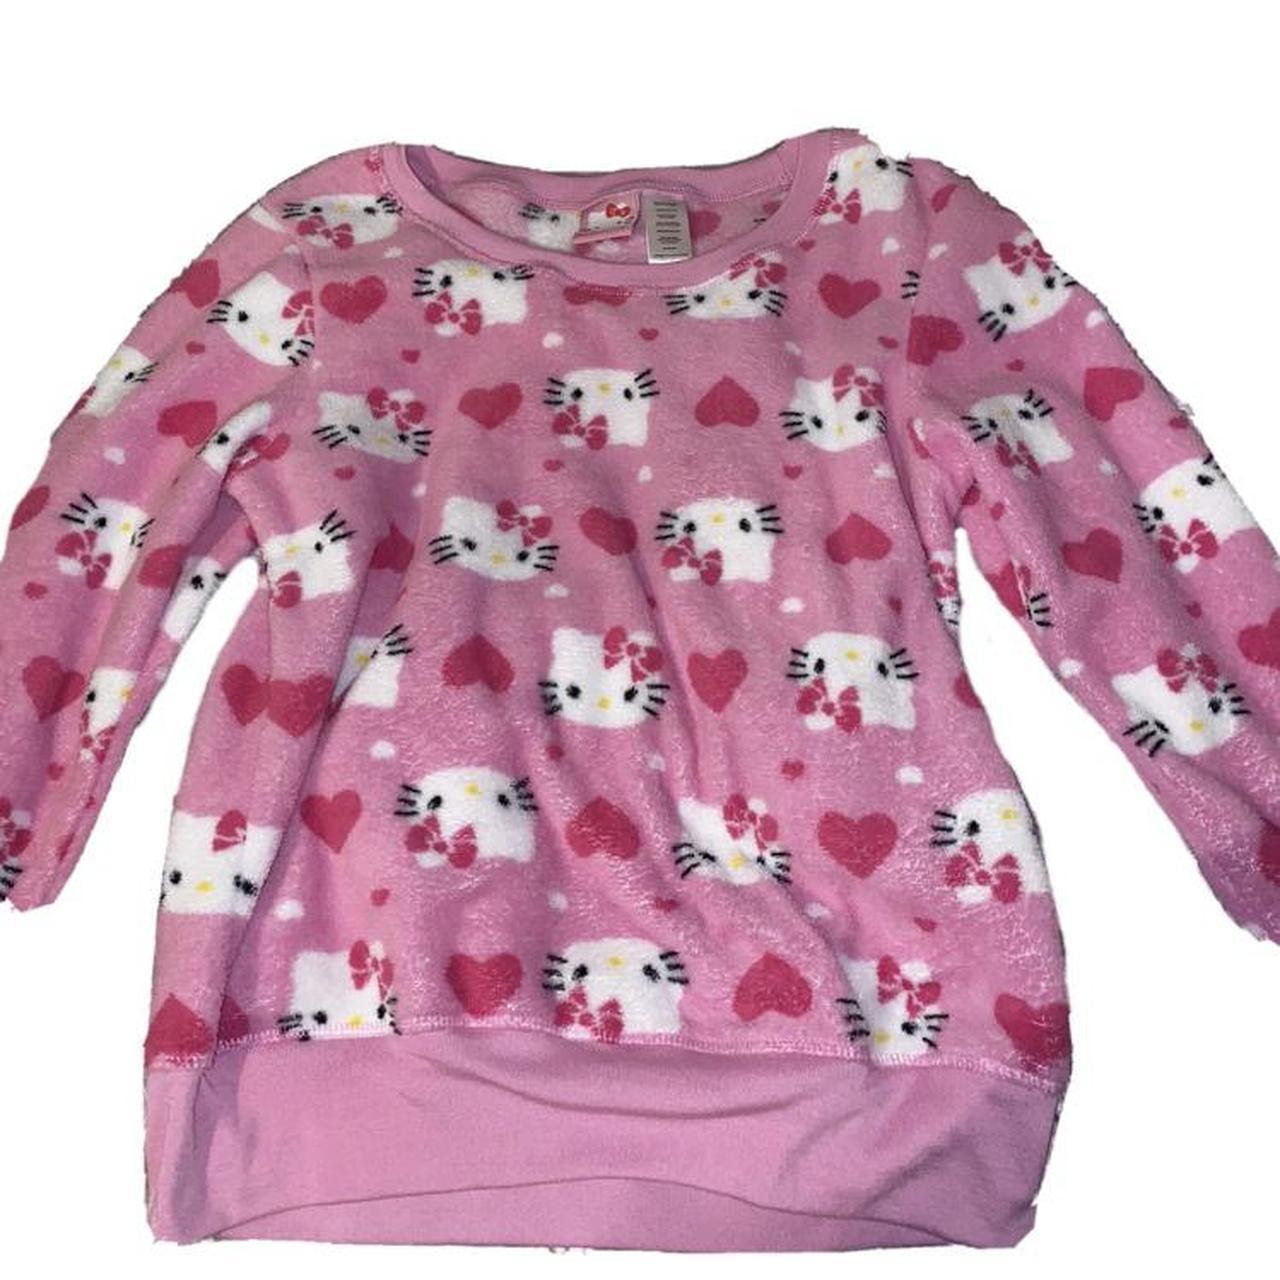 Product Image 1 - Hello Kitty PJ Top 💞 ♡